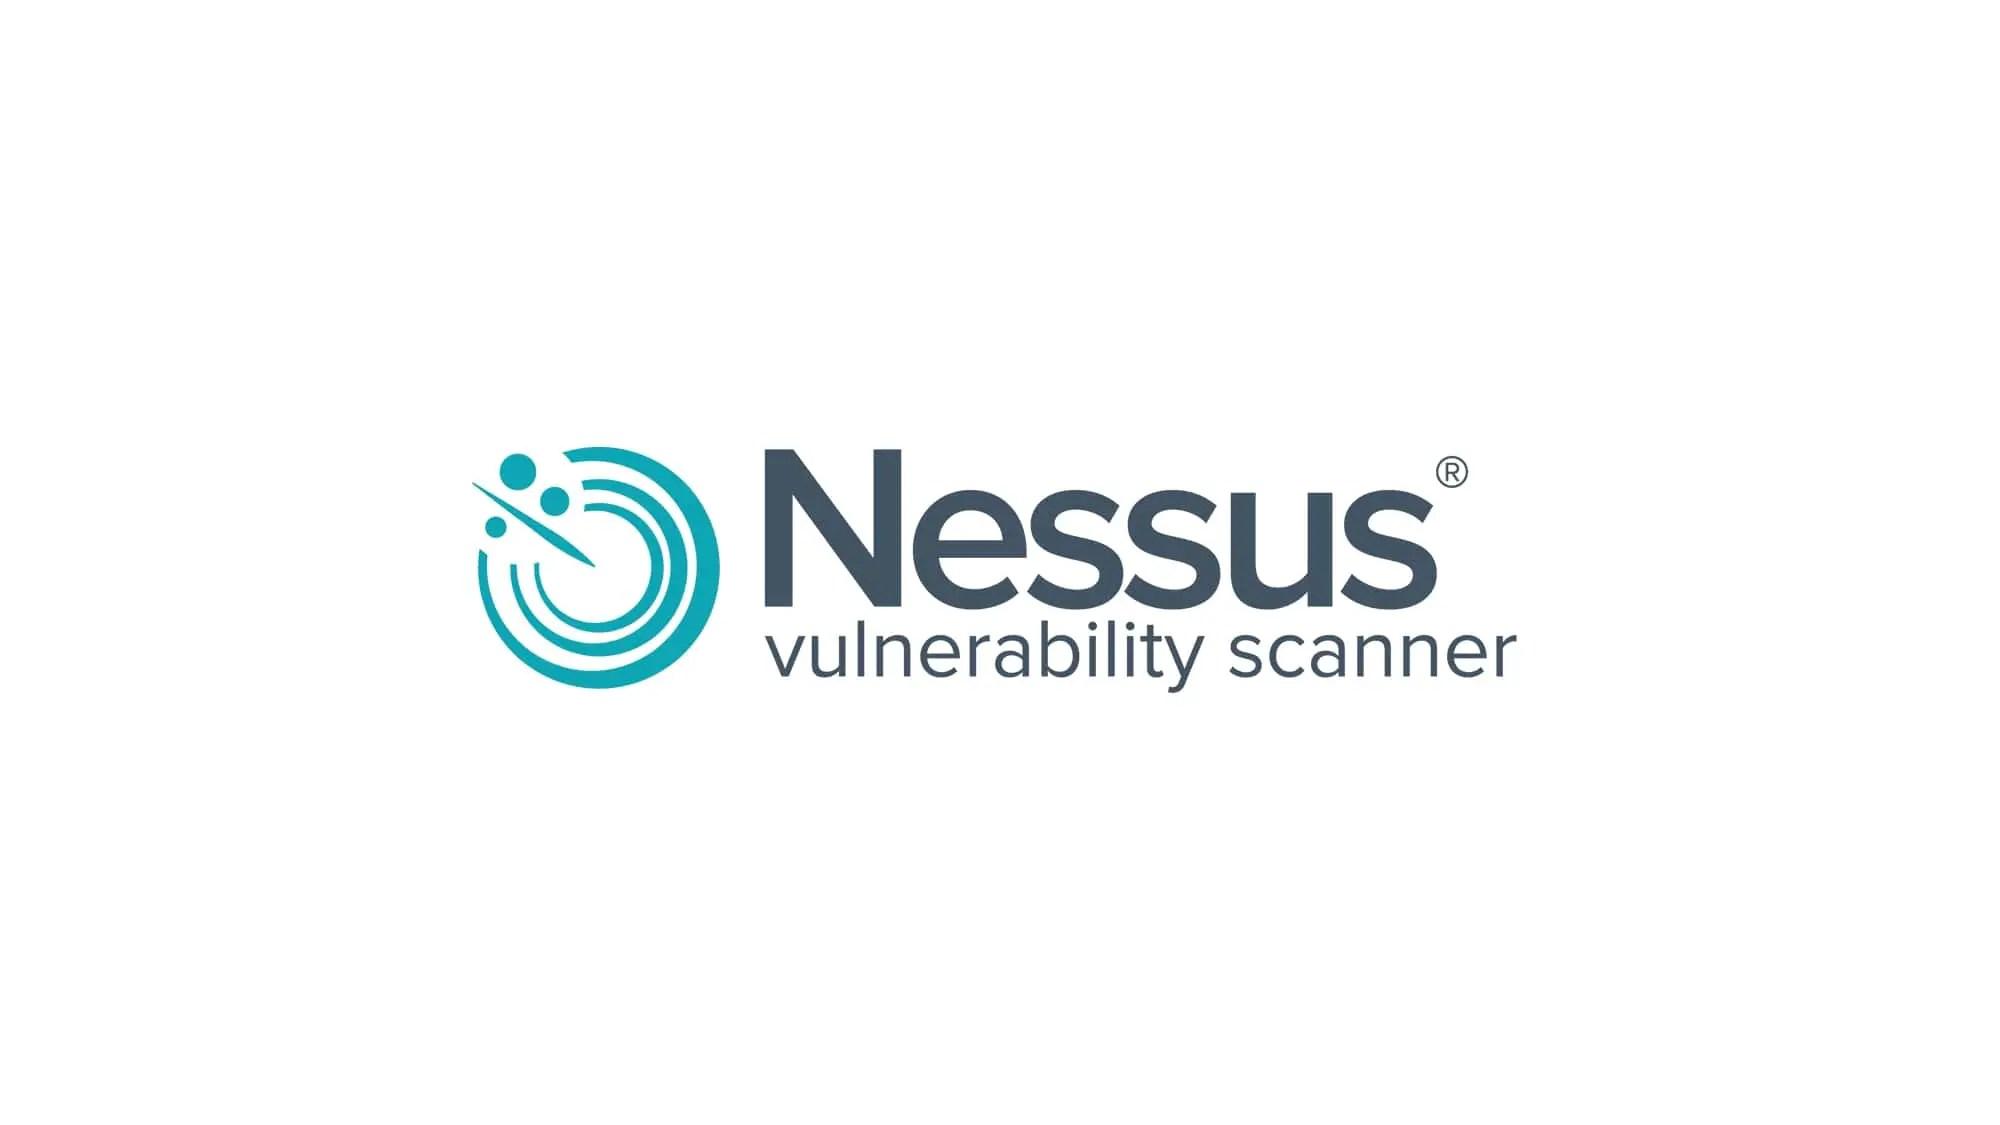 Come installare e configurare Nessus Scanner su Ubuntu 18